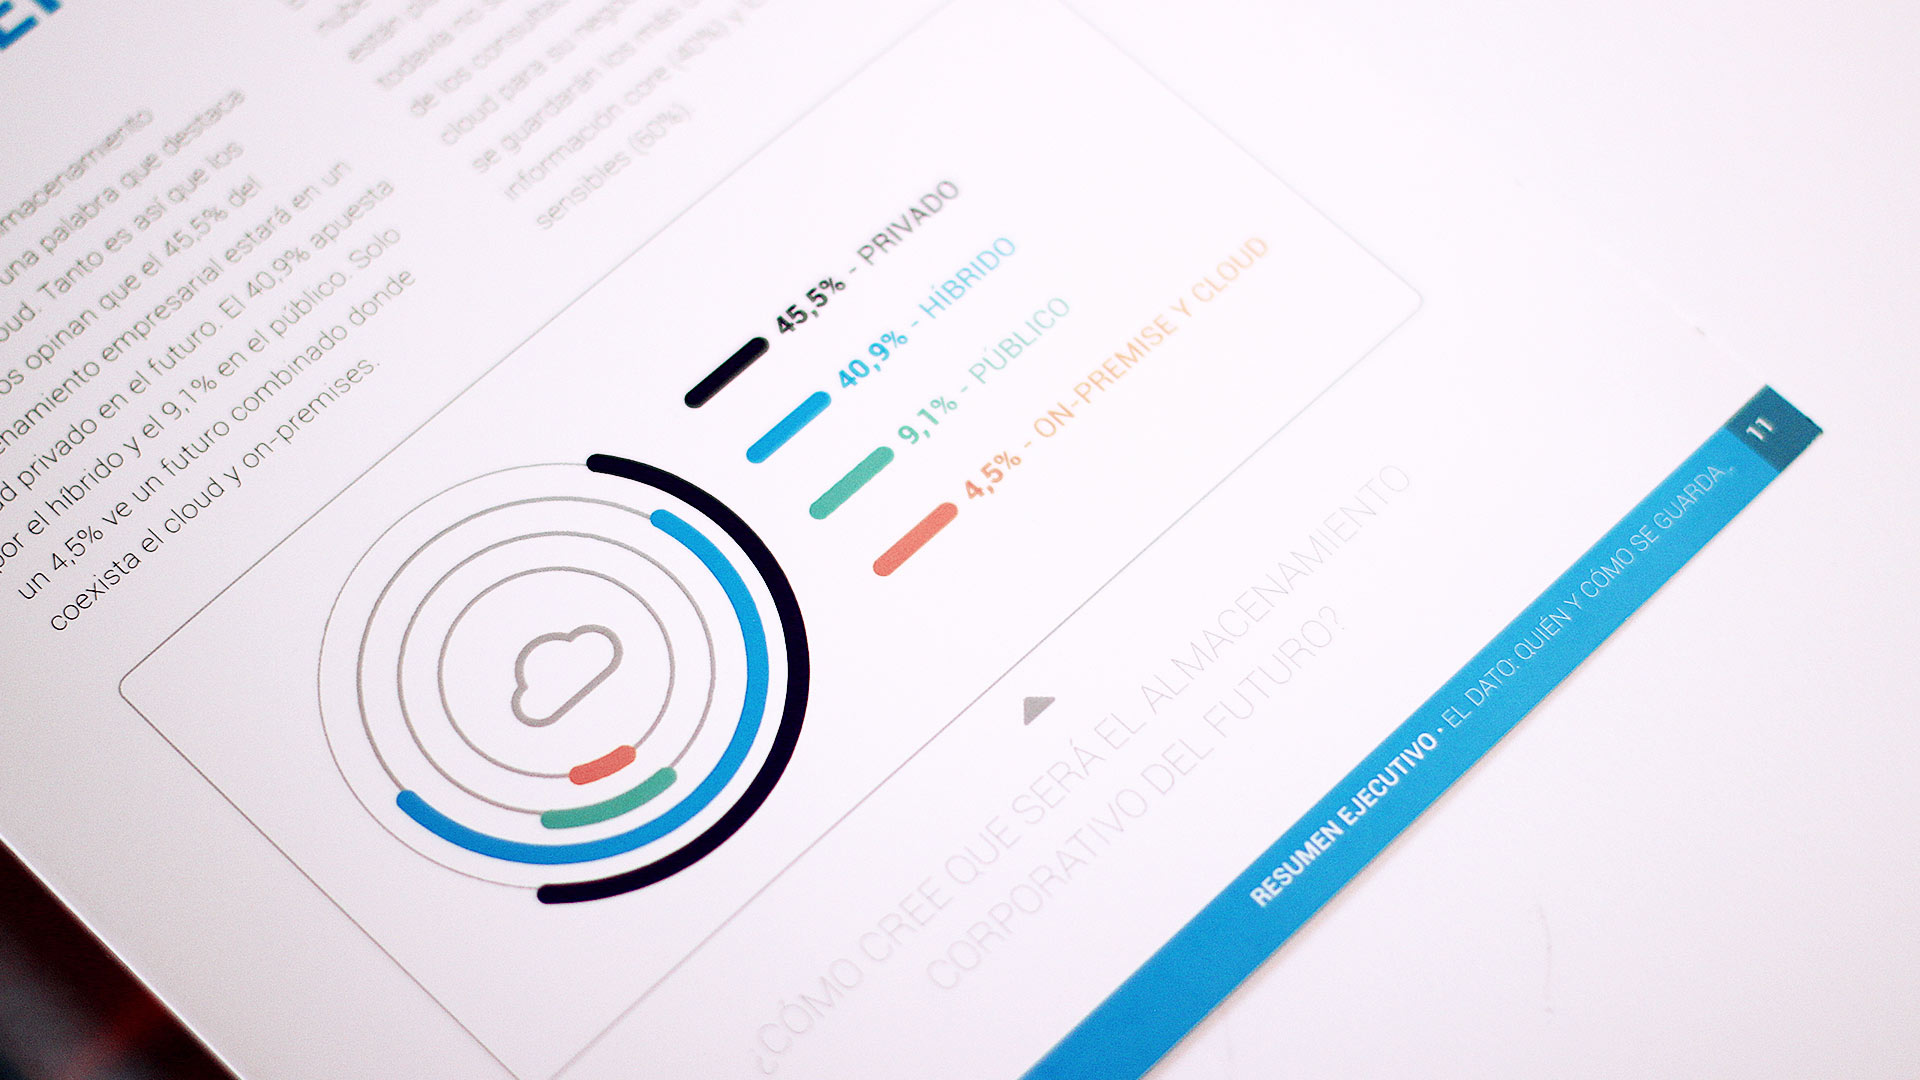 netapp-mediacloud-content-marketing-informe-resumen-ejecutivo-ebook-2017-19